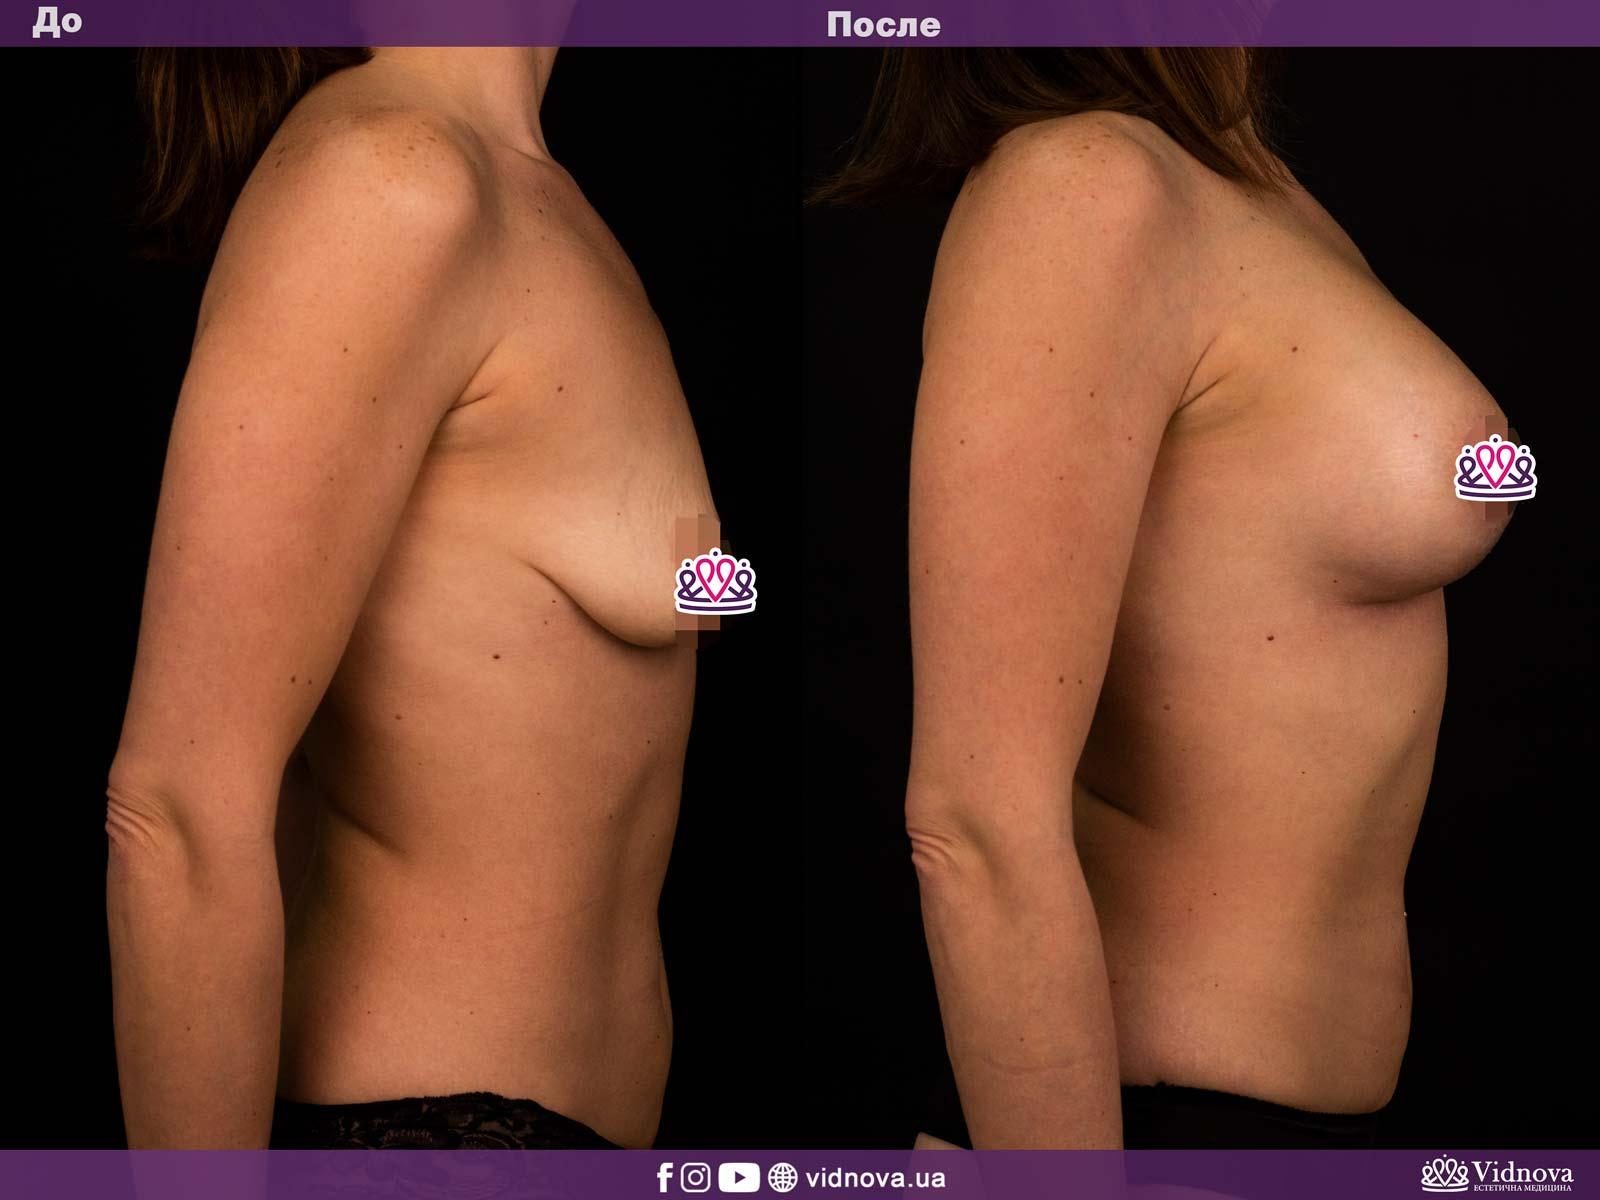 Подтяжка груди: Фото ДО и ПОСЛЕ - Пример №3-3 - Клиника Vidnova